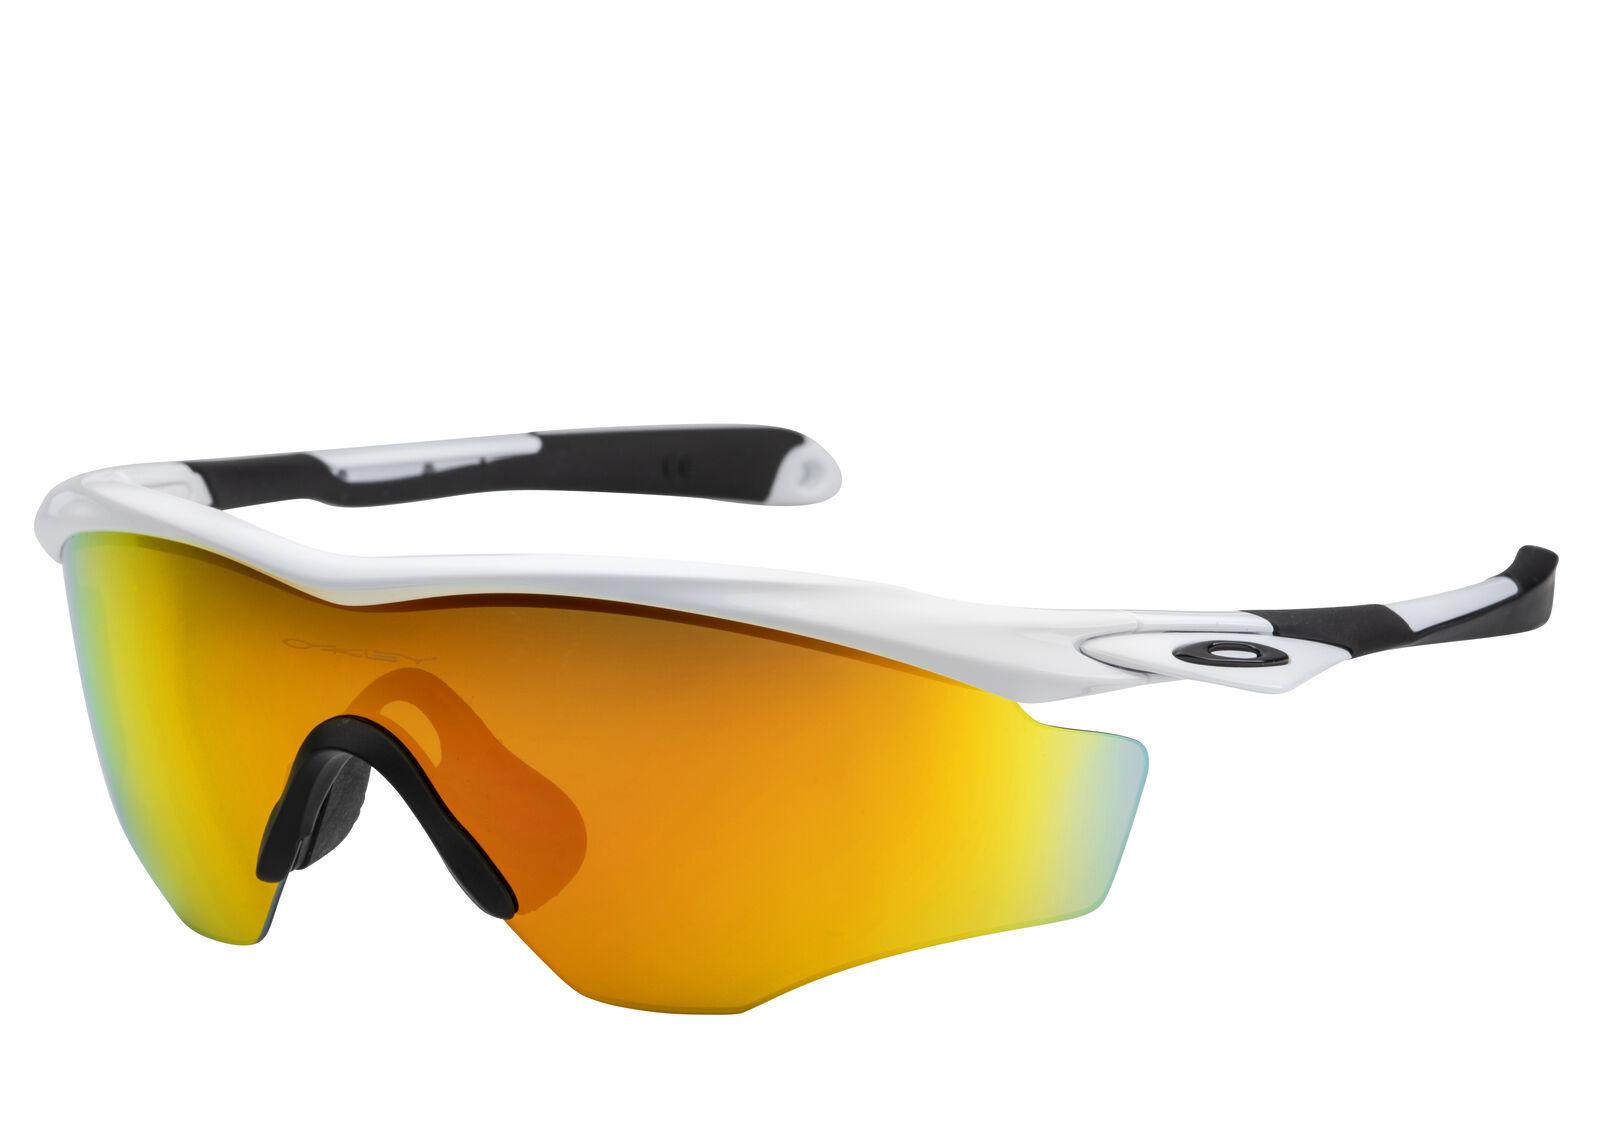 2d22374bcf Oakley Men s Mirrored M2 OO9343-05 White Fire Iridium Wrap Sunglasses